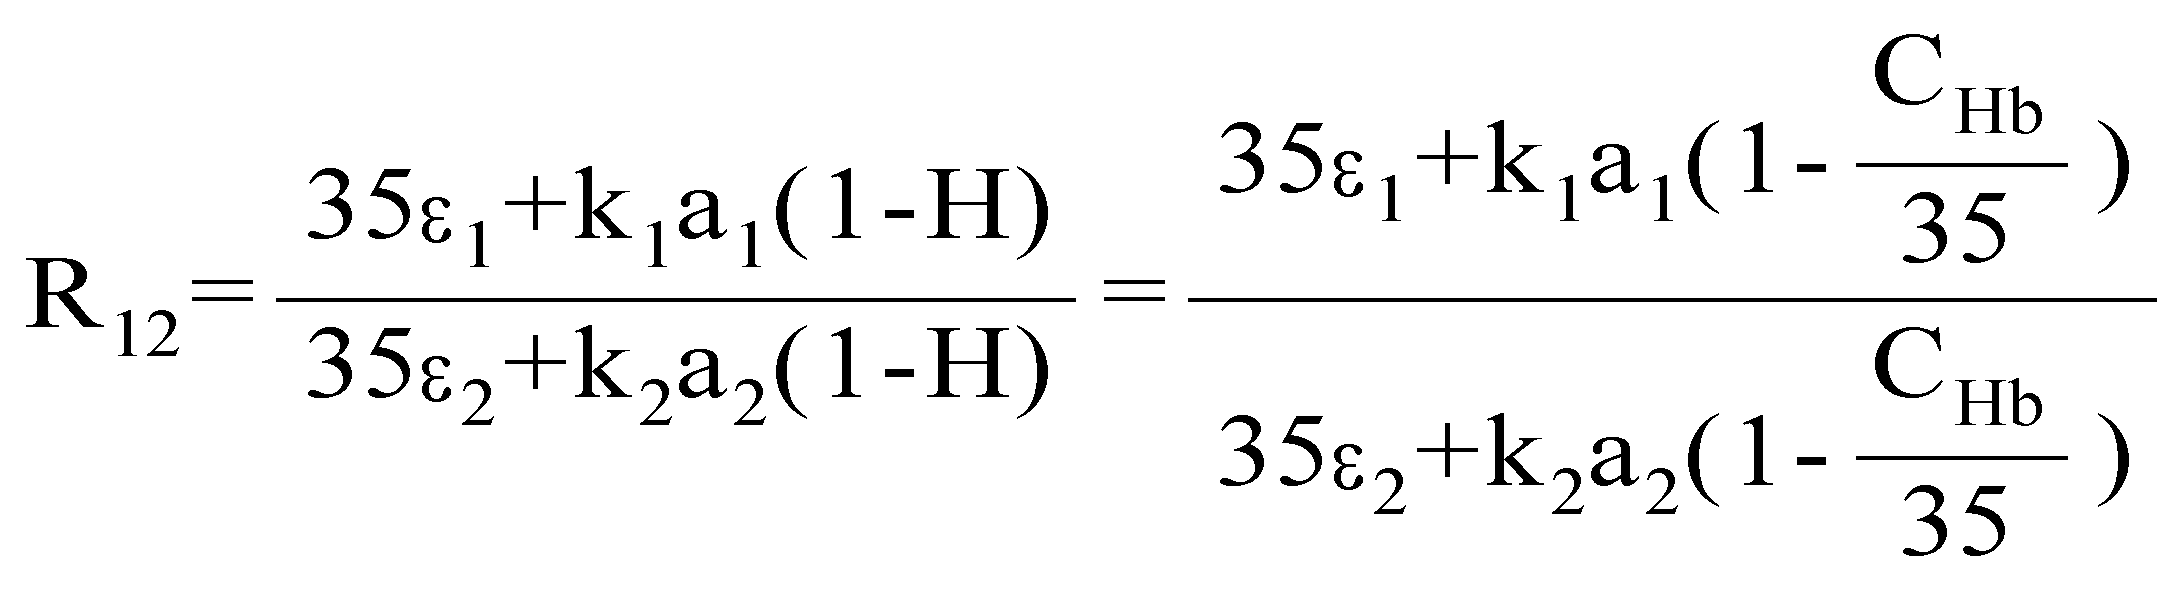 Figure 112001008936775-pat00012